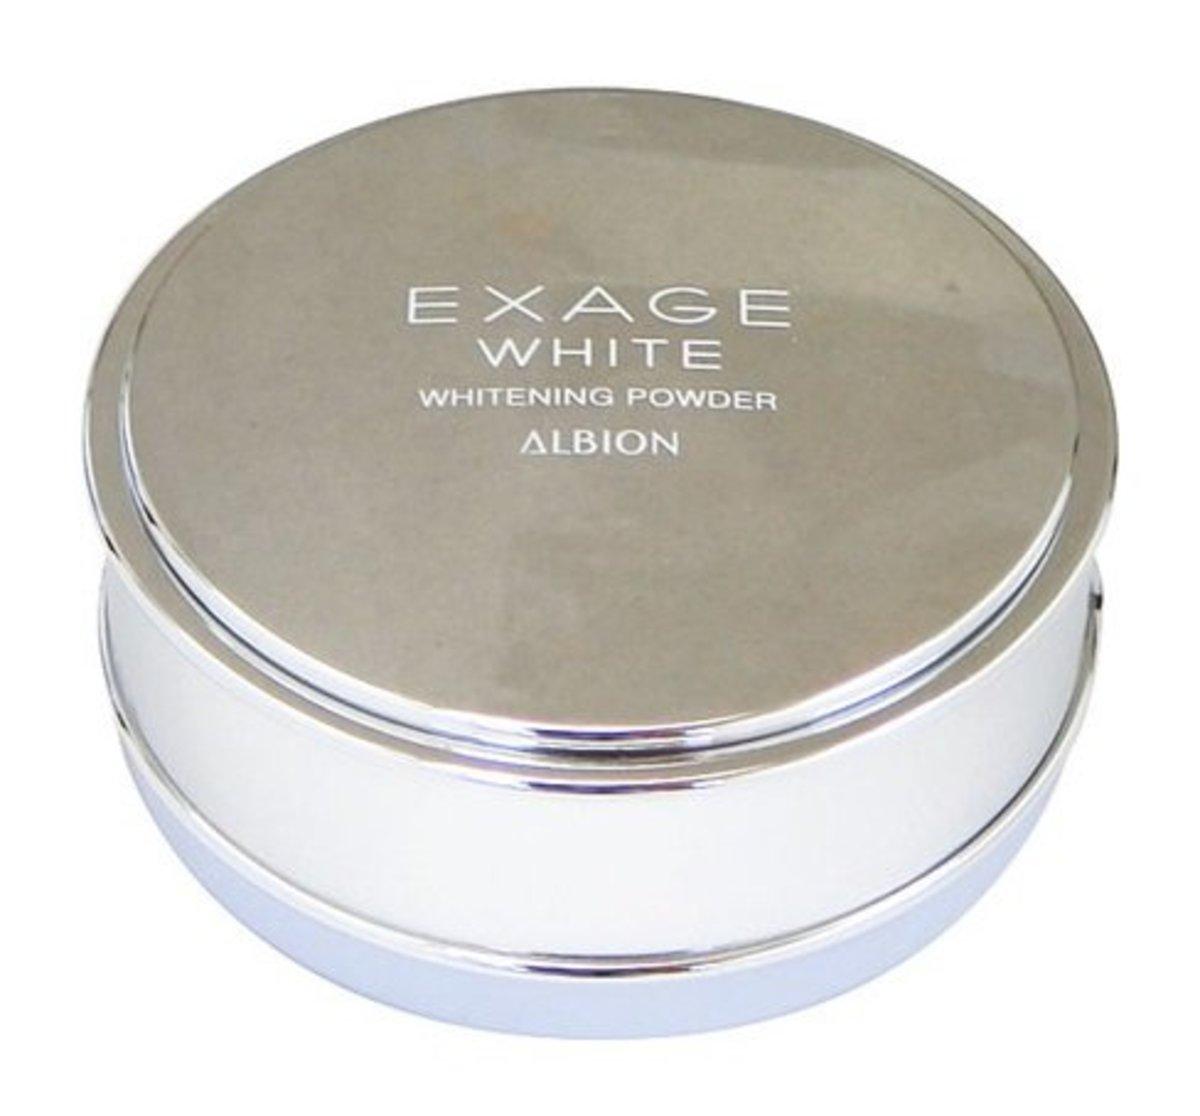 Exage White Whitening Powder 18g